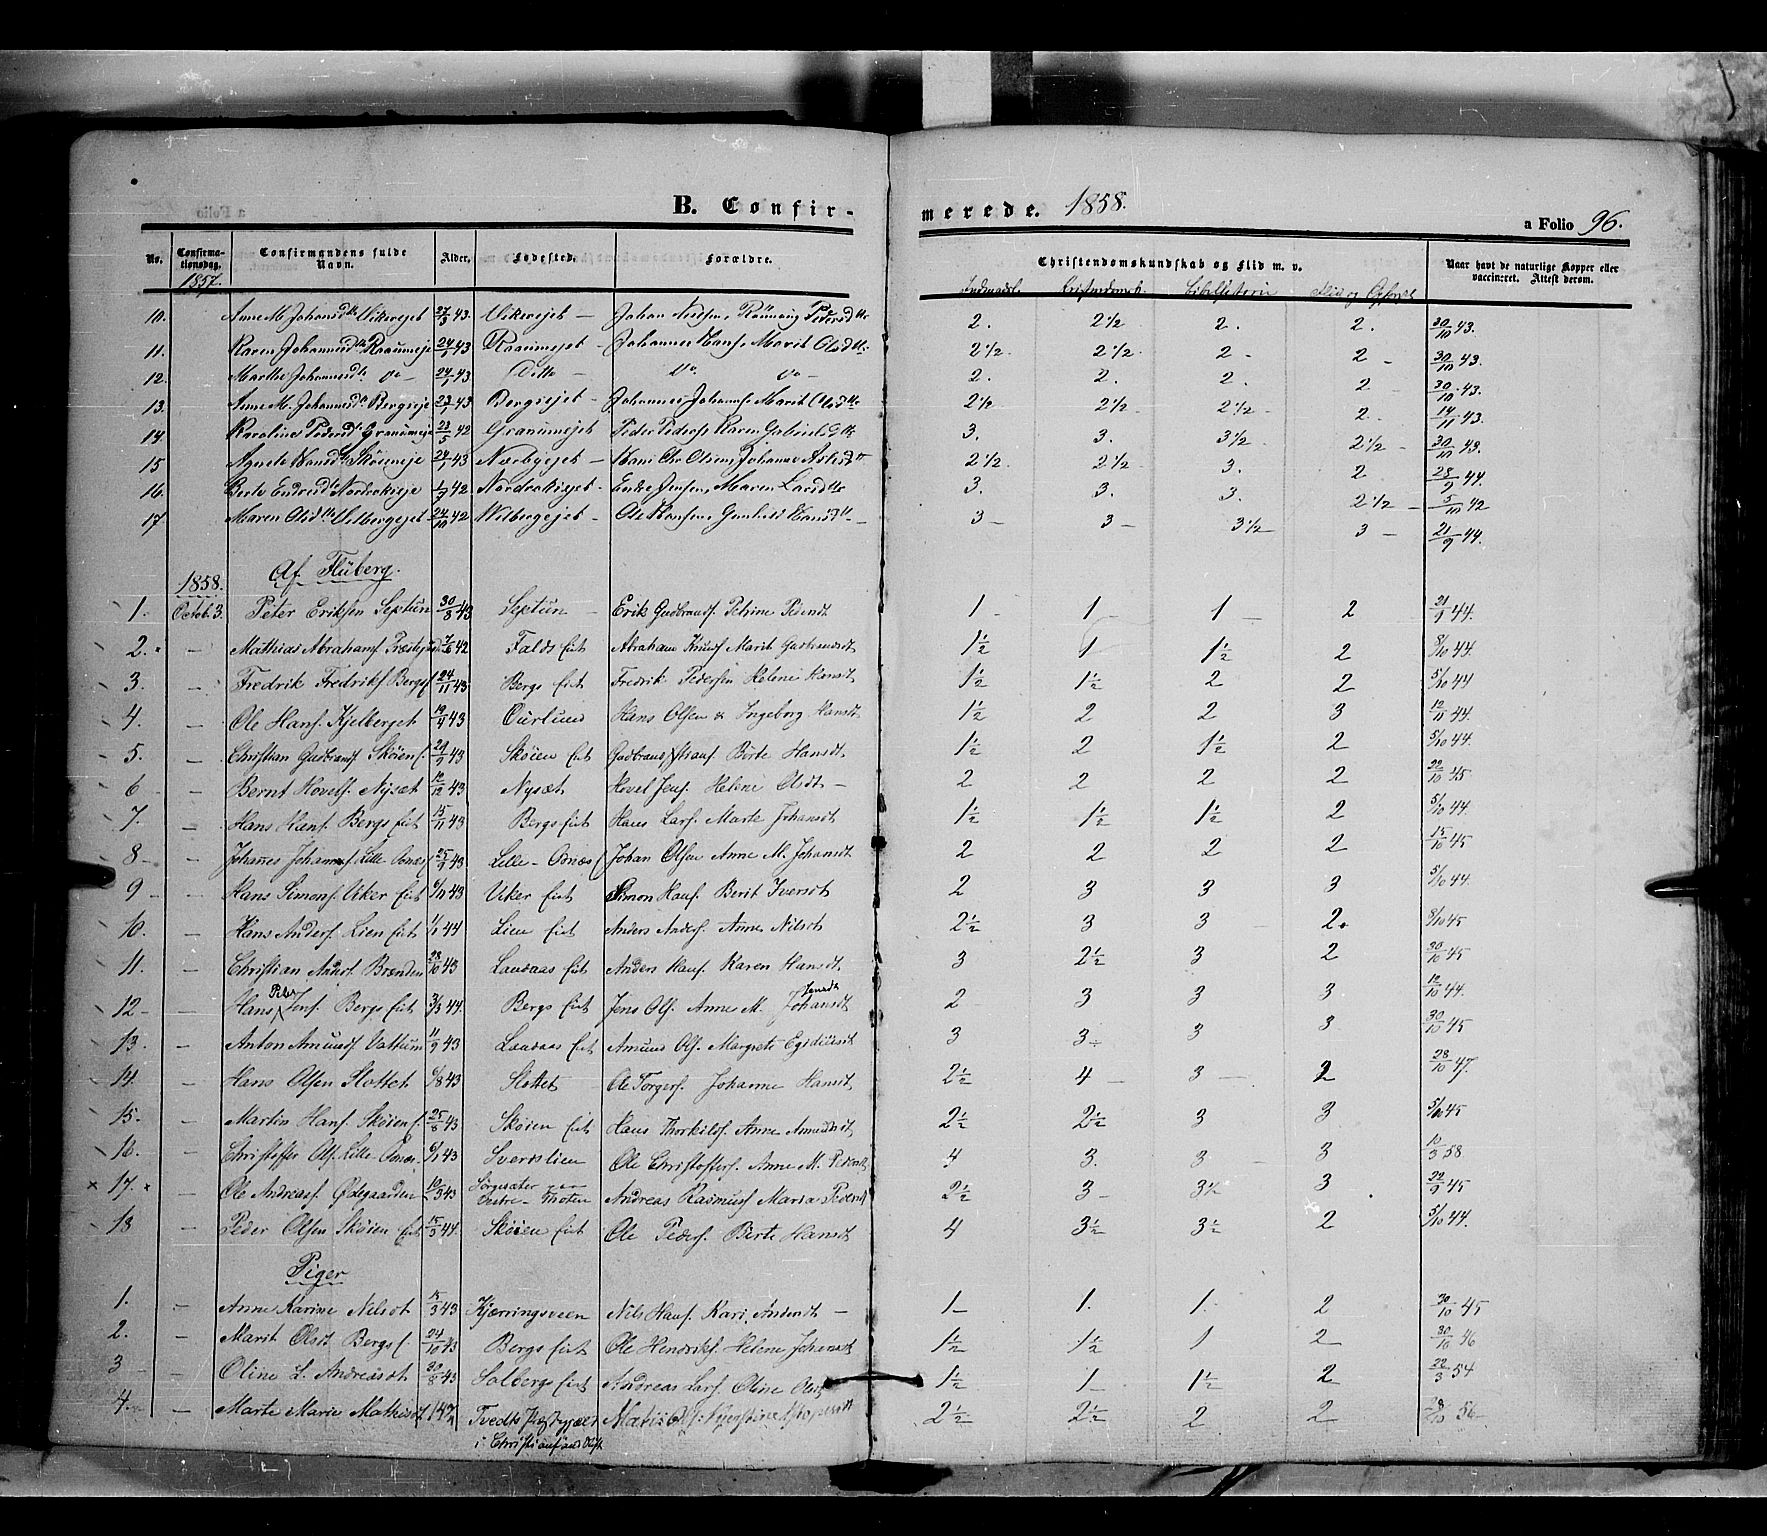 SAH, Land prestekontor, Ministerialbok nr. 9, 1847-1859, s. 96